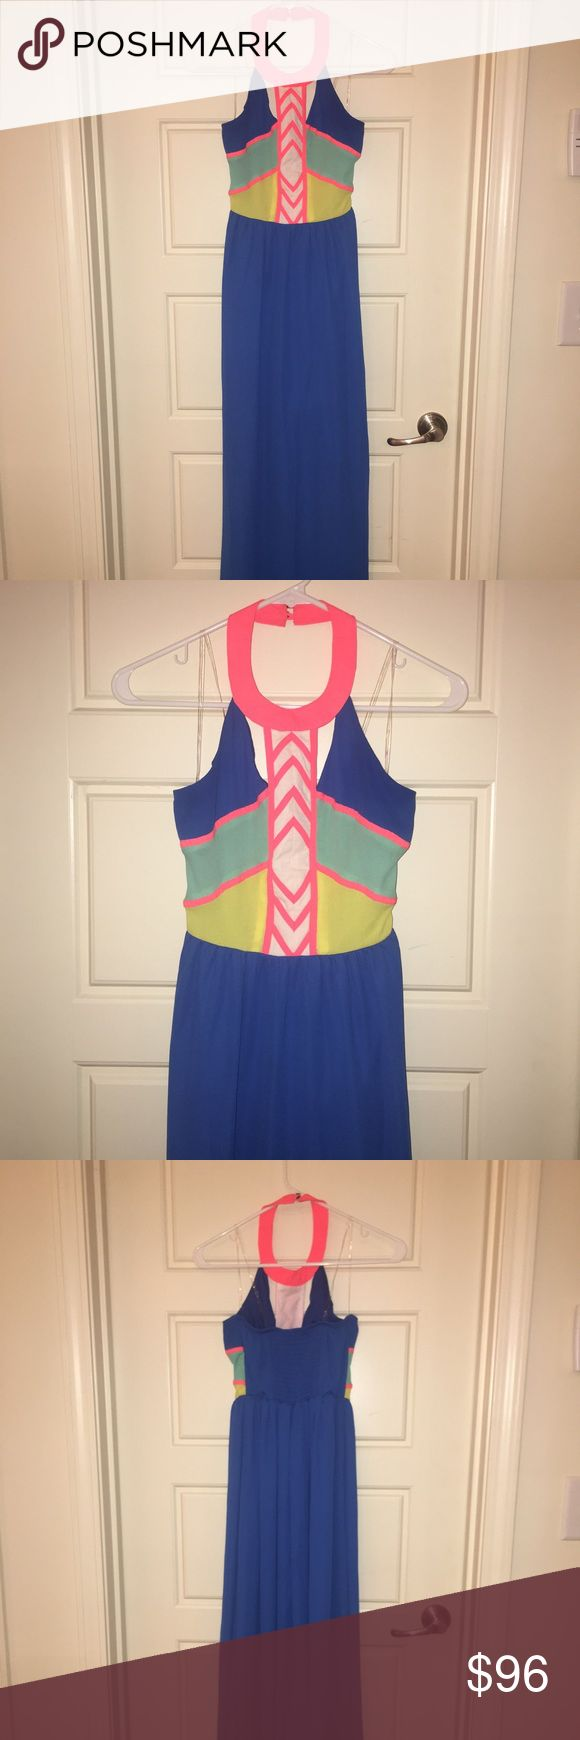 EUC Gianni Bini Mack dress, size 0 EUC, Gianni Bini maxi dress, chiffon material, size 0 Gianni Bini Dresses Maxi